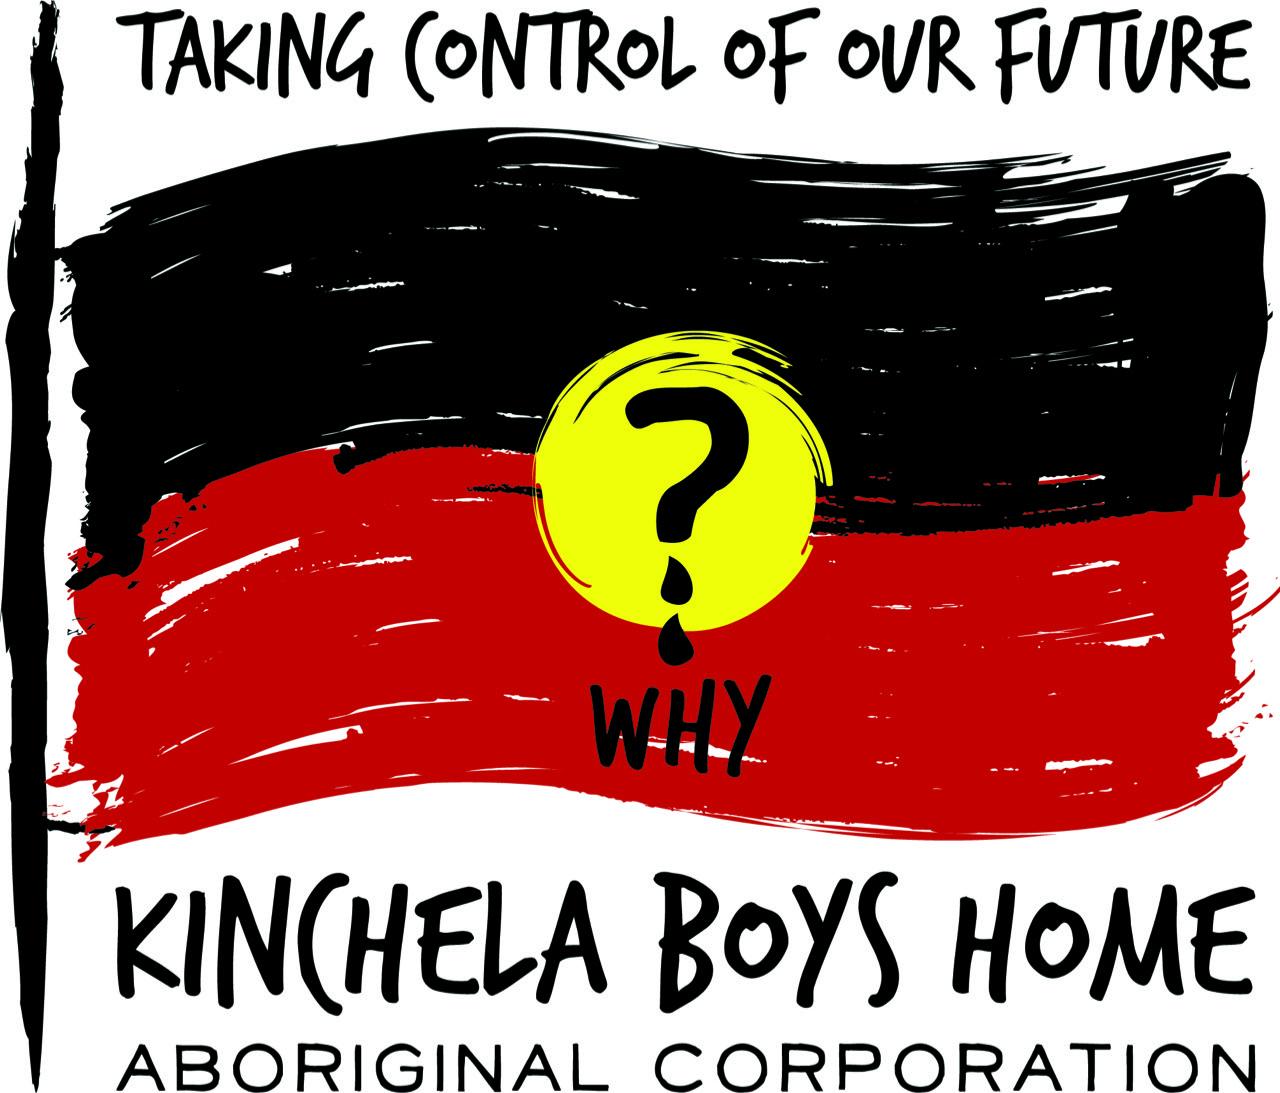 Kinchela Boys Home Aboriginal Corporation